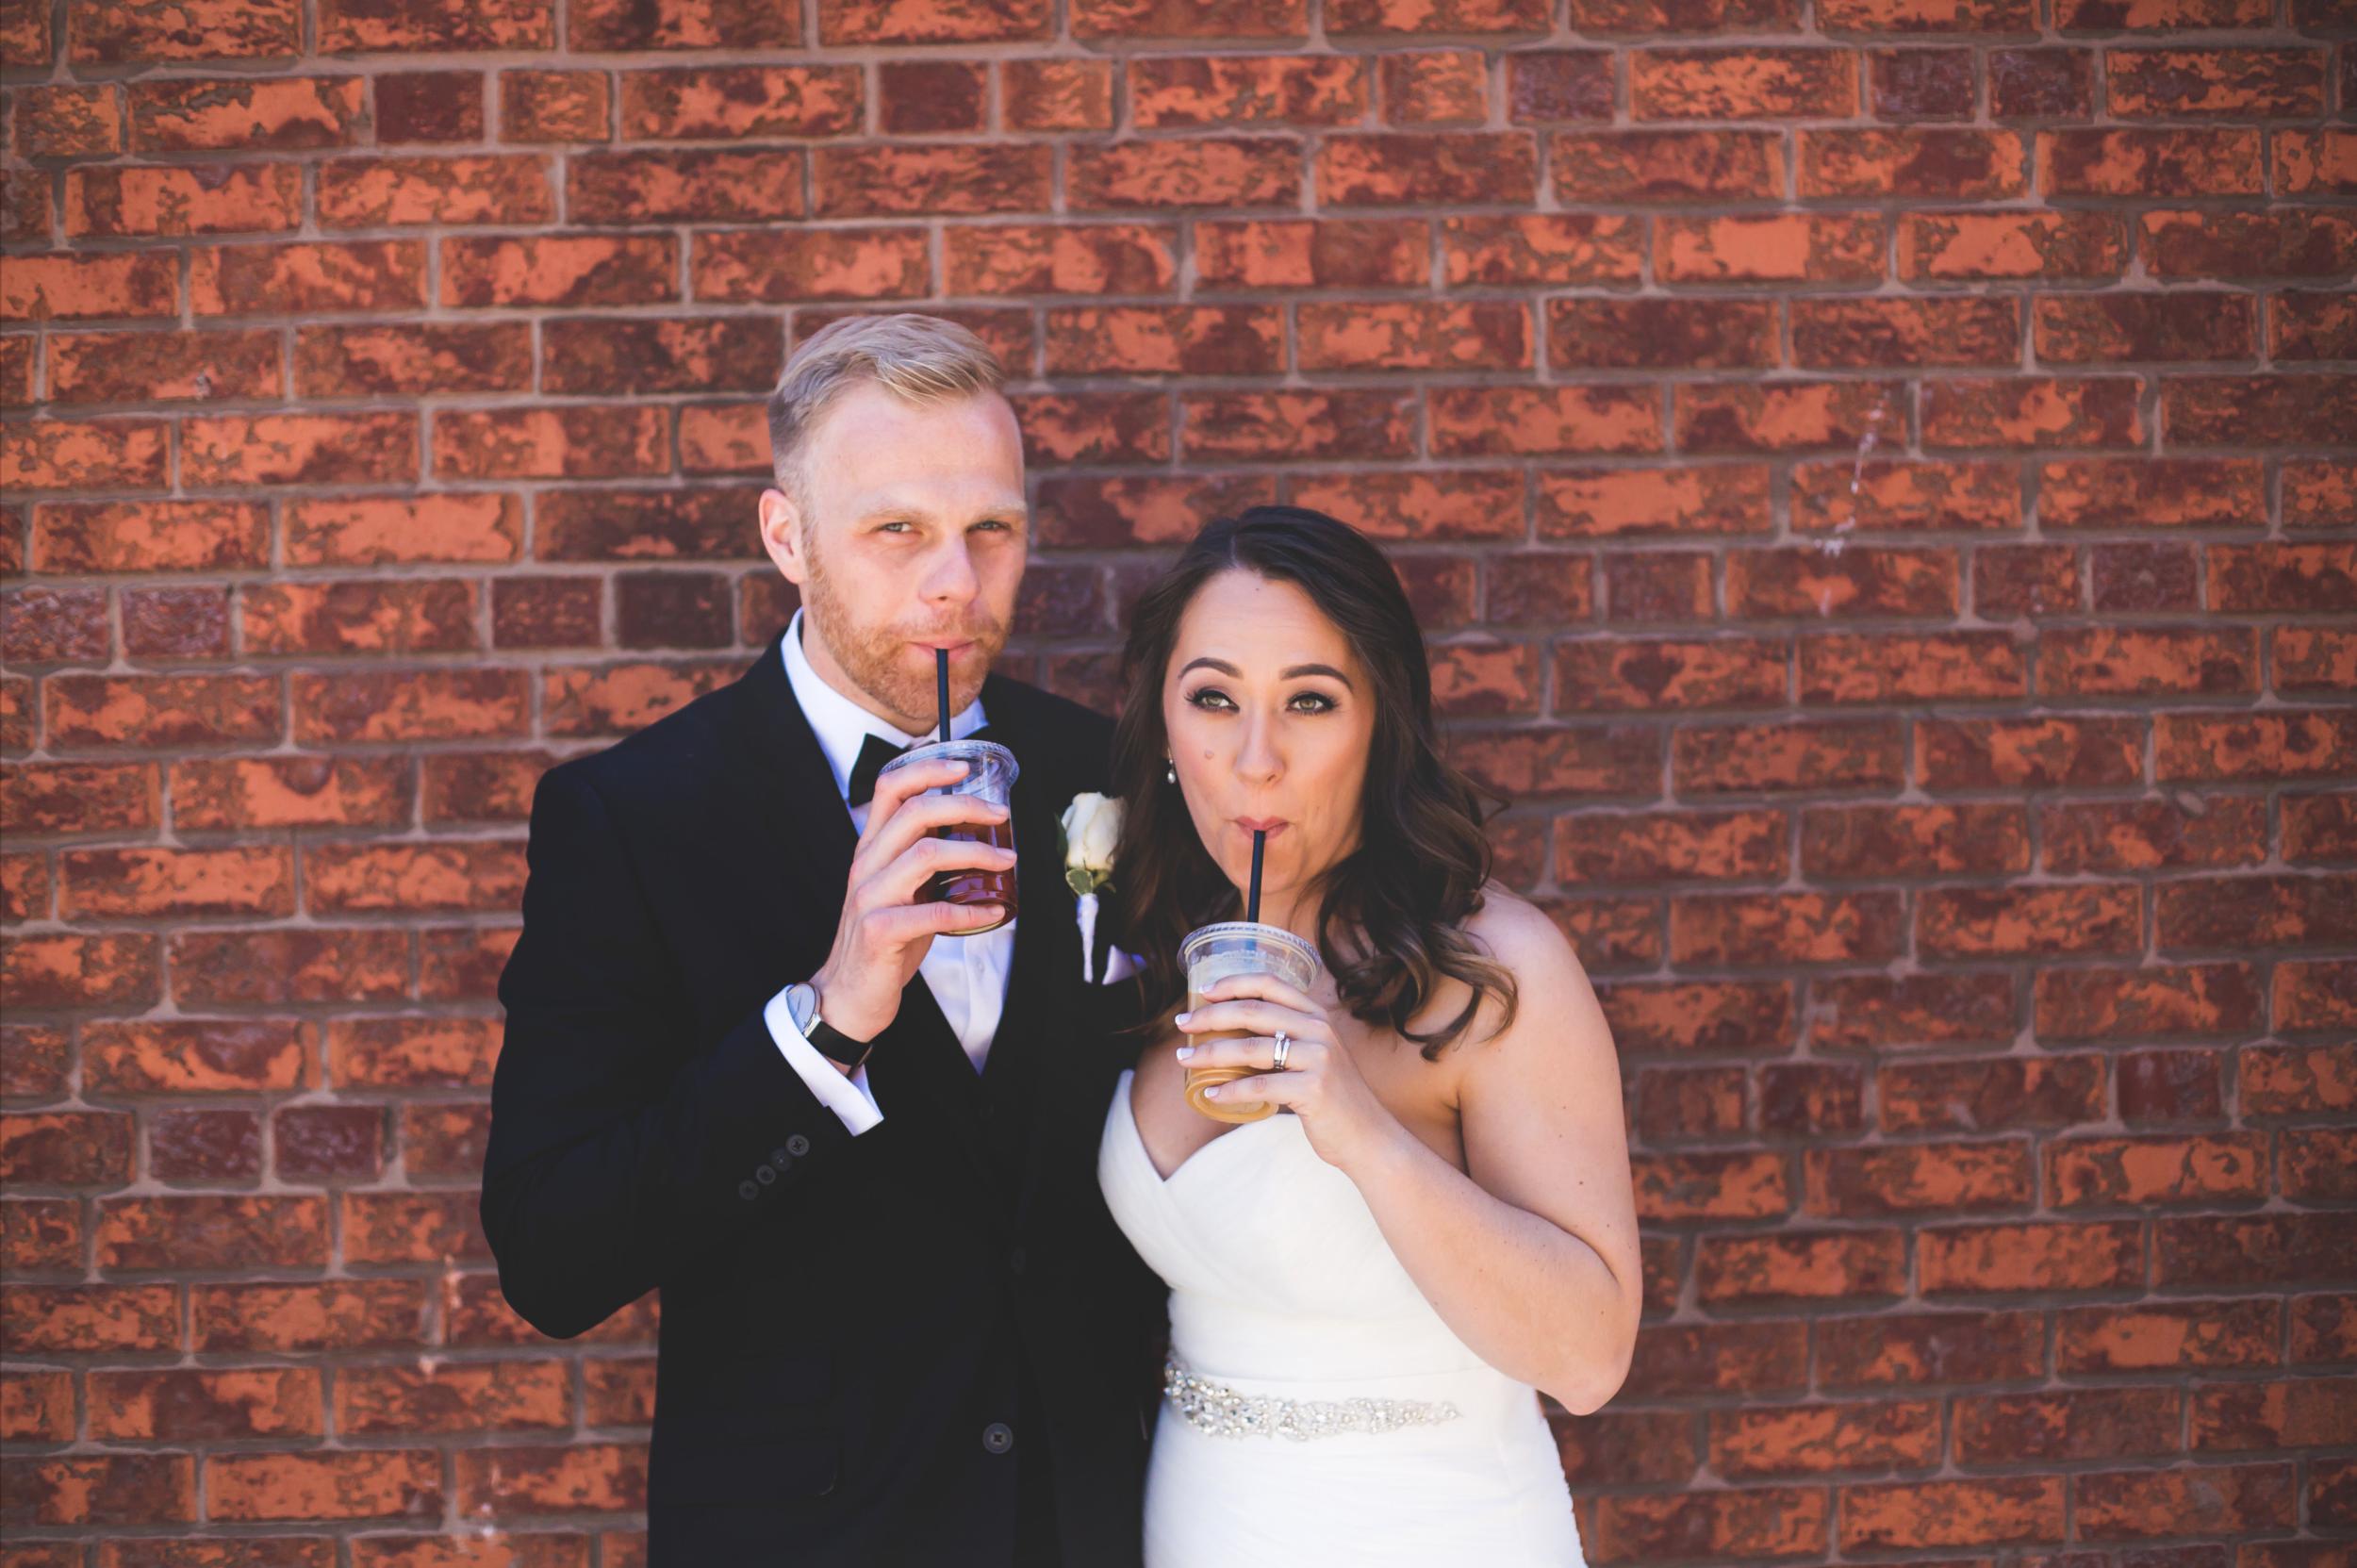 Wedding-Harbour-Banquet-Center-Oakville-Photographer-Wedding-Hamilton-Saint-James-Espresso-Downtown-HamOnt-GTA-Niagara-Toronto-Moments-by-Lauren-Photography-Photo-Image-34.png